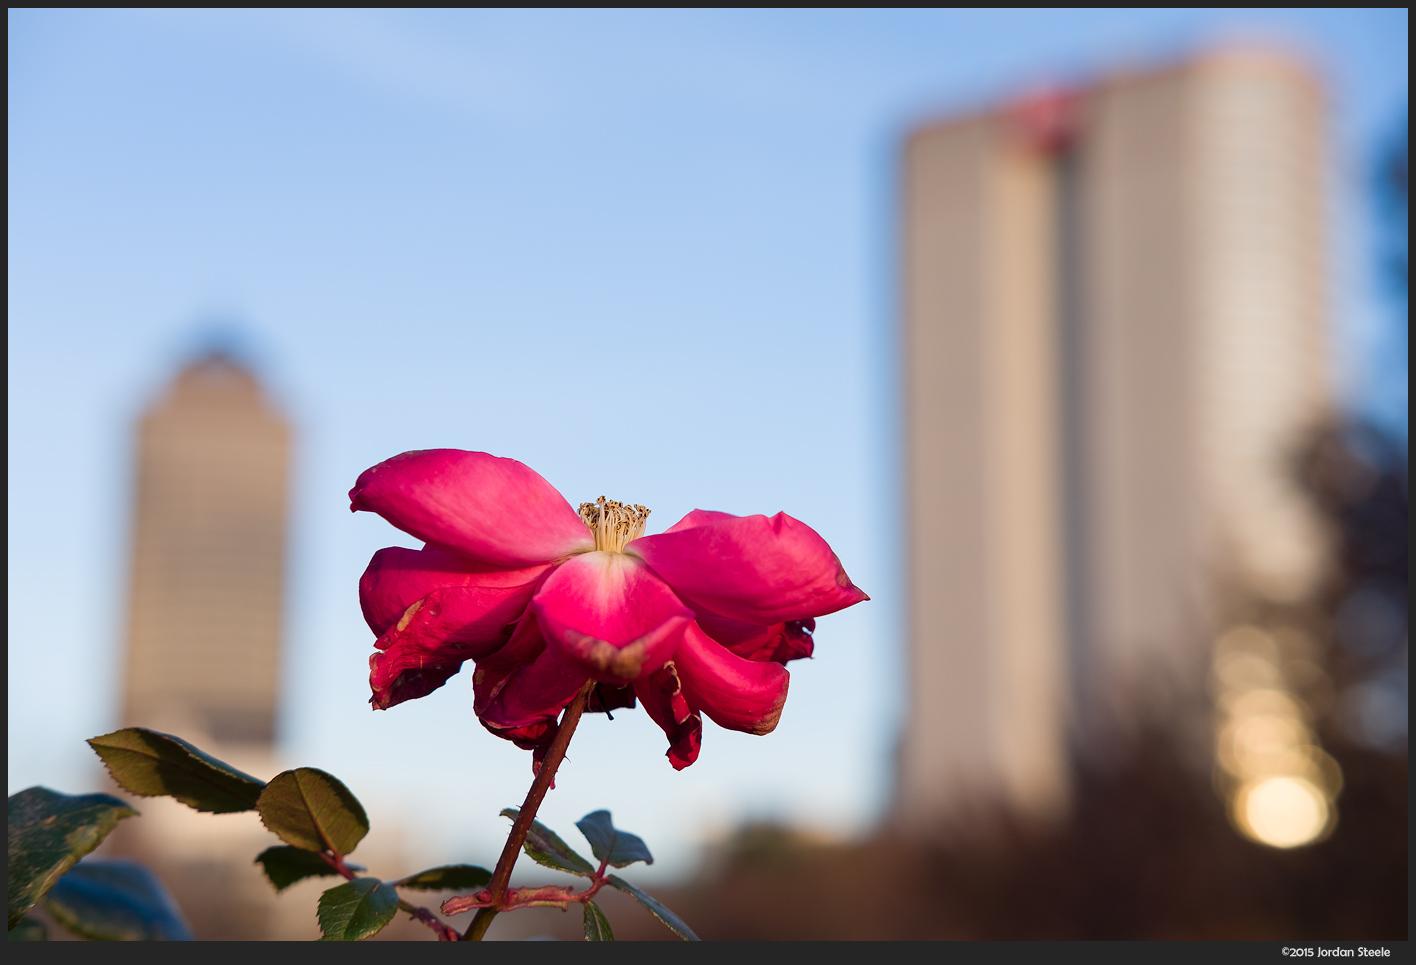 City Flower - Fujifilm X-E2 with Fujinon XF 35mm f/2 R WR @ f/5.6